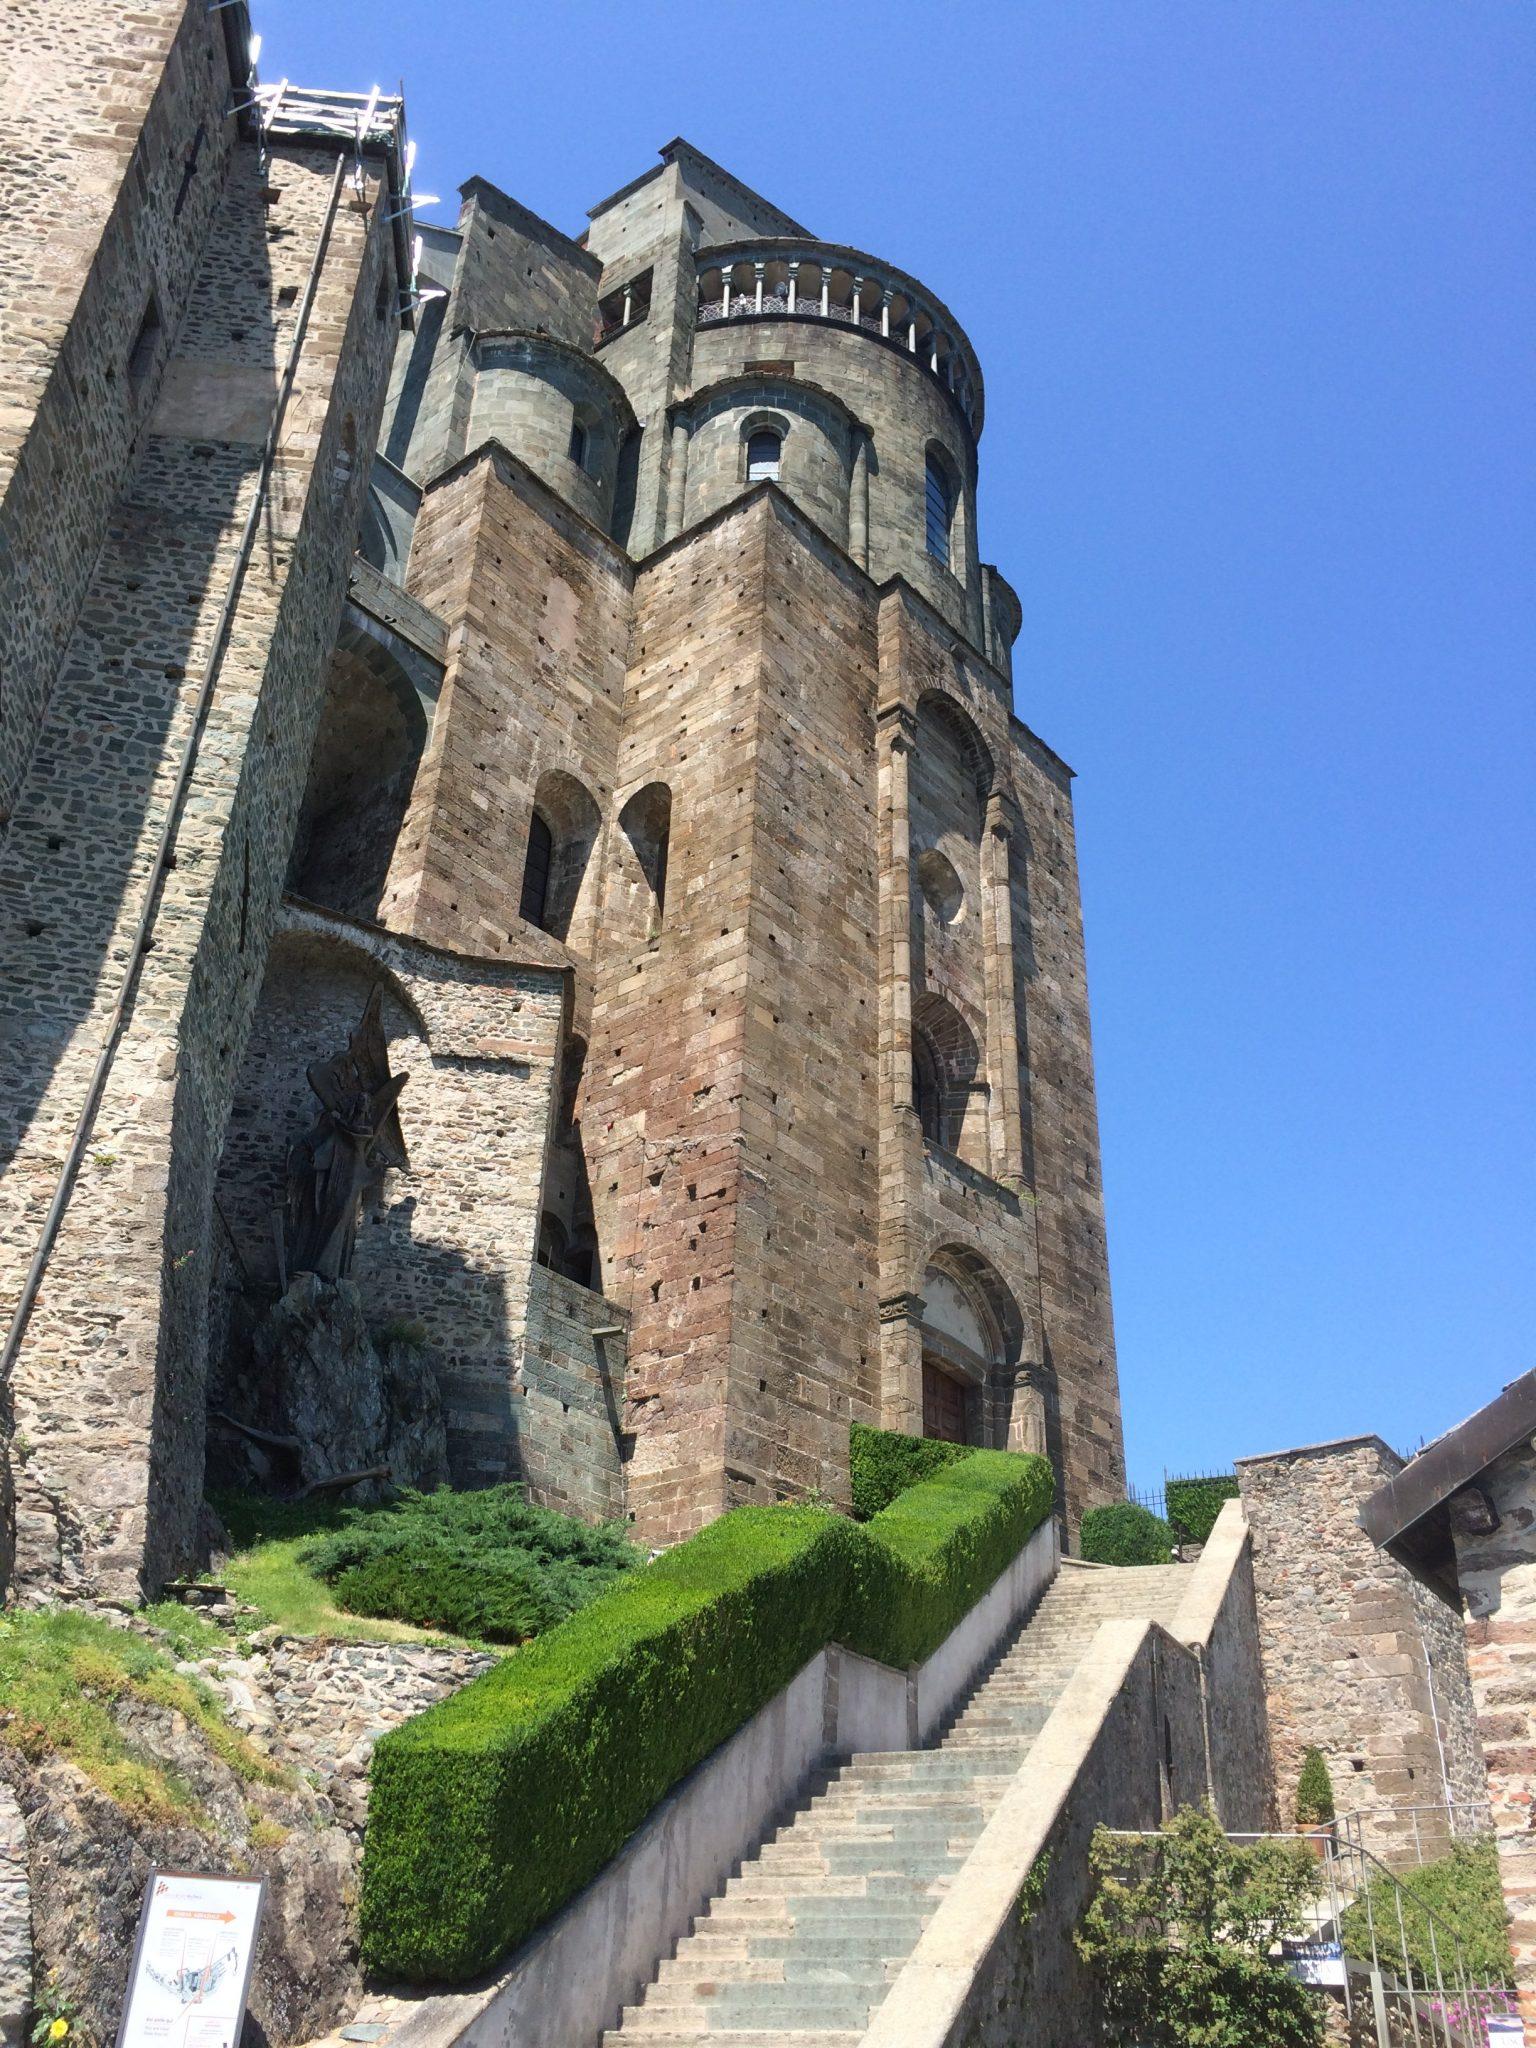 img 4232 - Sacra di San Michele: a monastery on the rocks